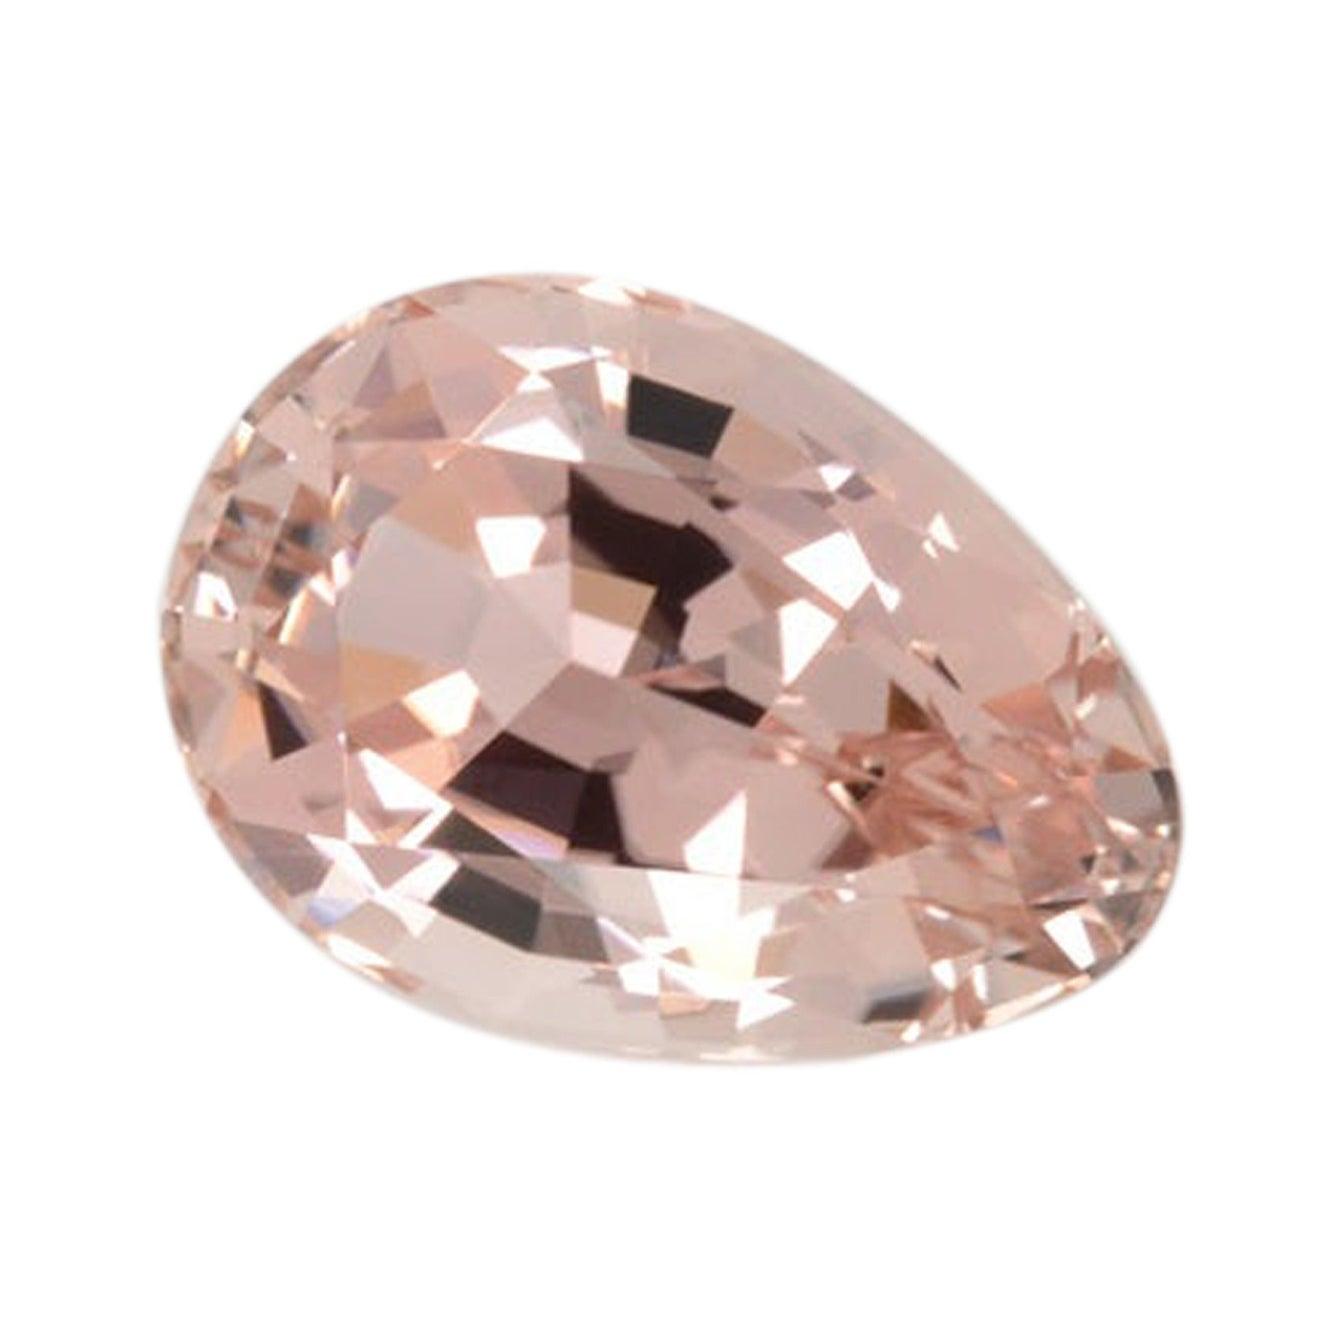 Peach Tourmaline Ring Gem 10.36 Carat Antique Pear Shape Loose Gemstone